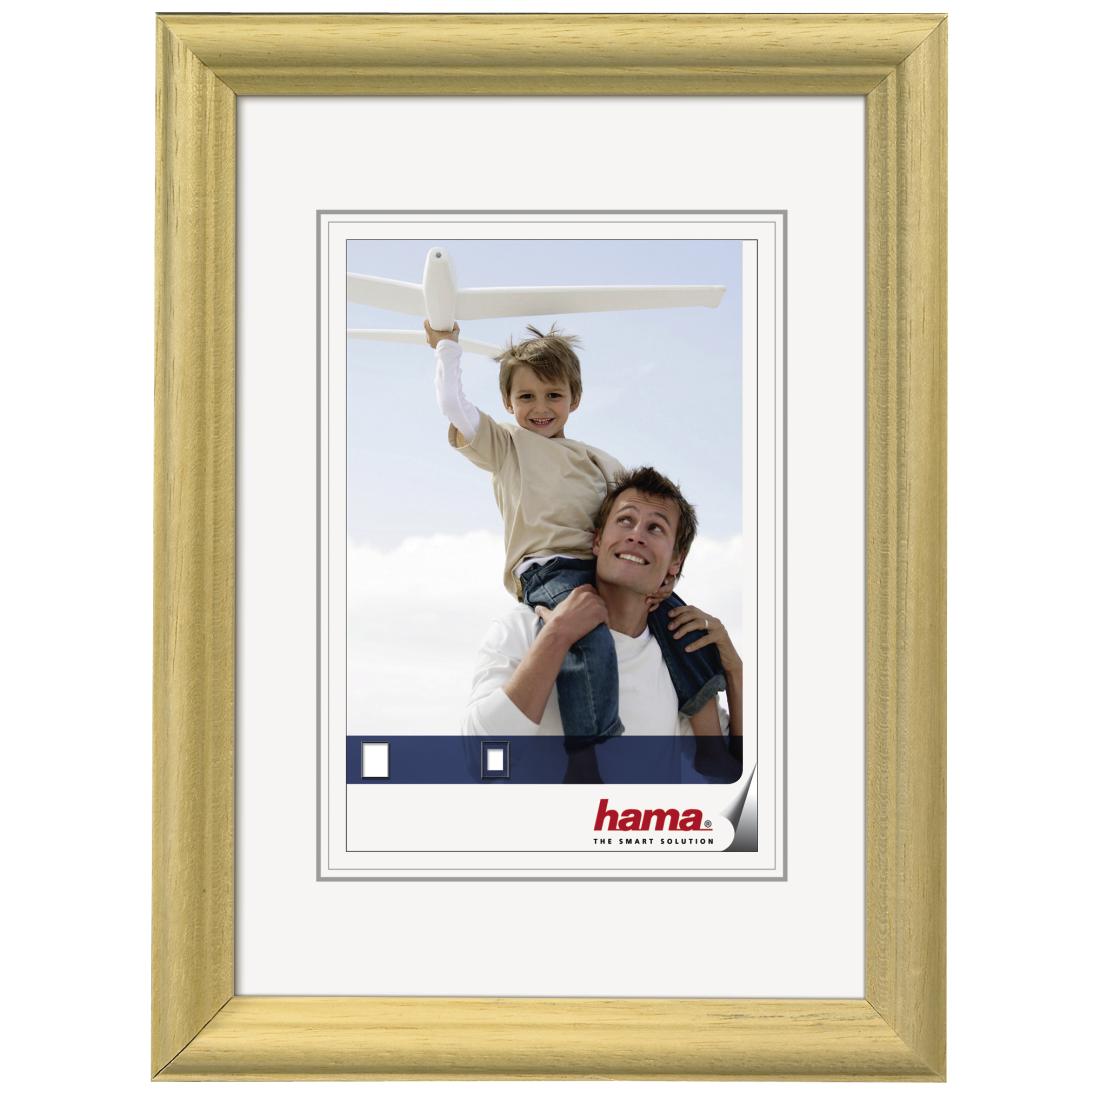 hama.com | 00034809 Hama Holzrahmen \